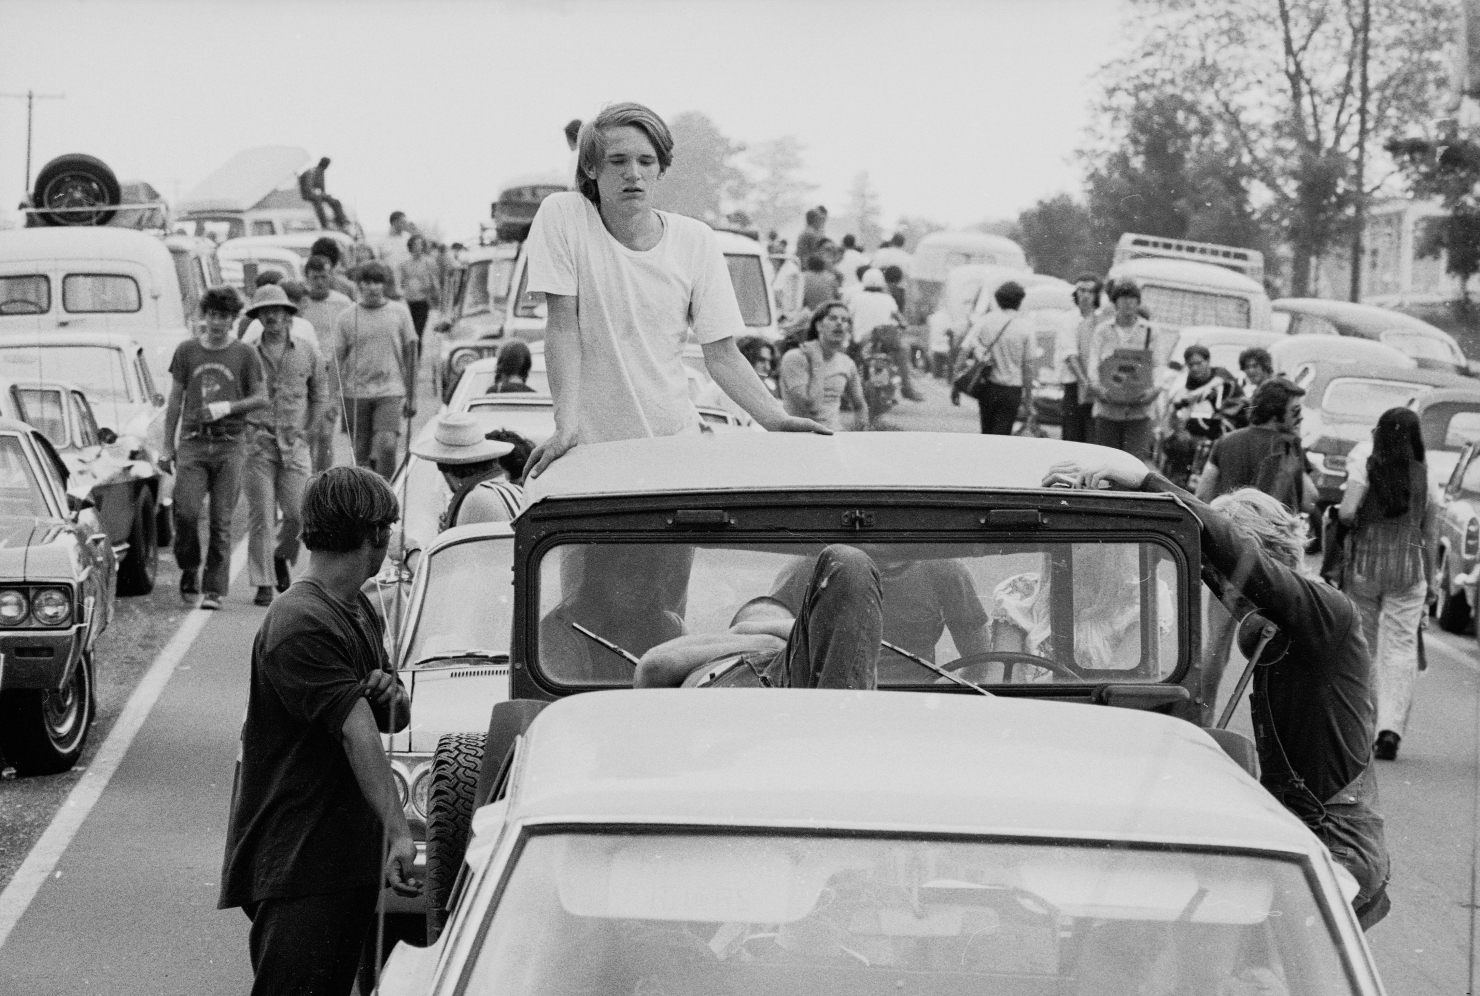 Fenomenul Woodstock-